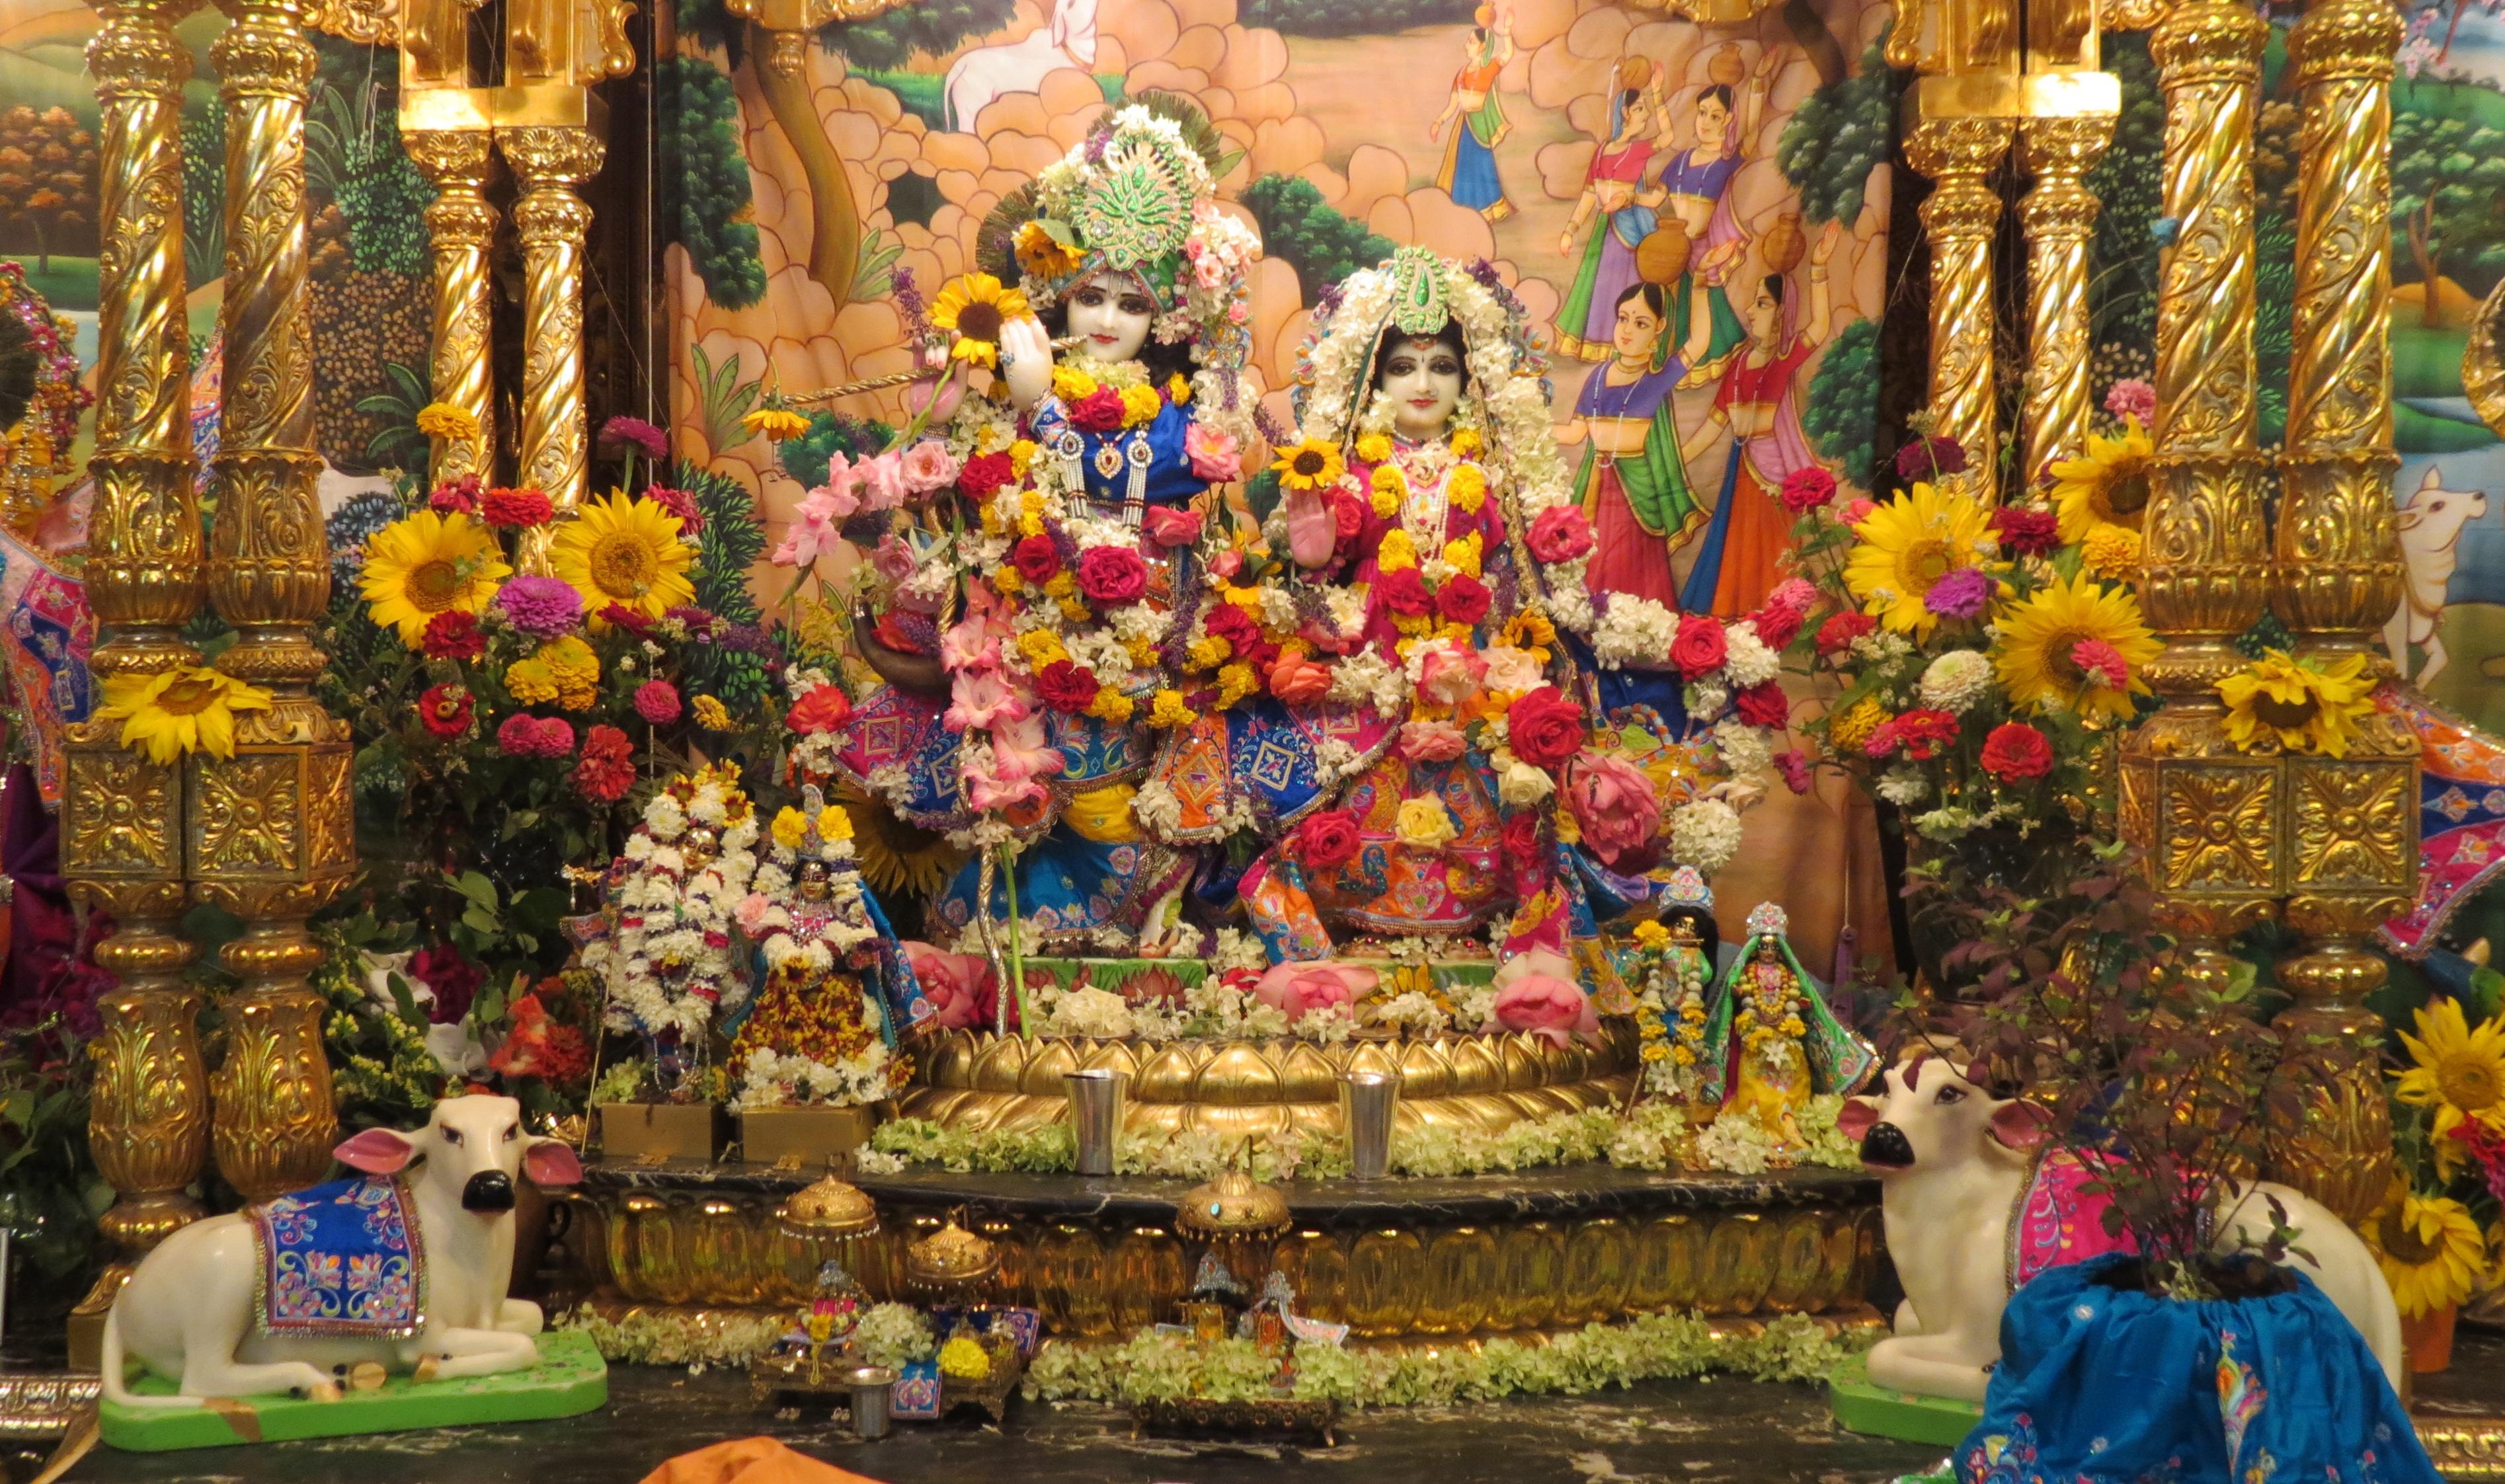 Loving krishna the hare krishna movement sri sri radha vrndavana chandra fandeluxe Image collections